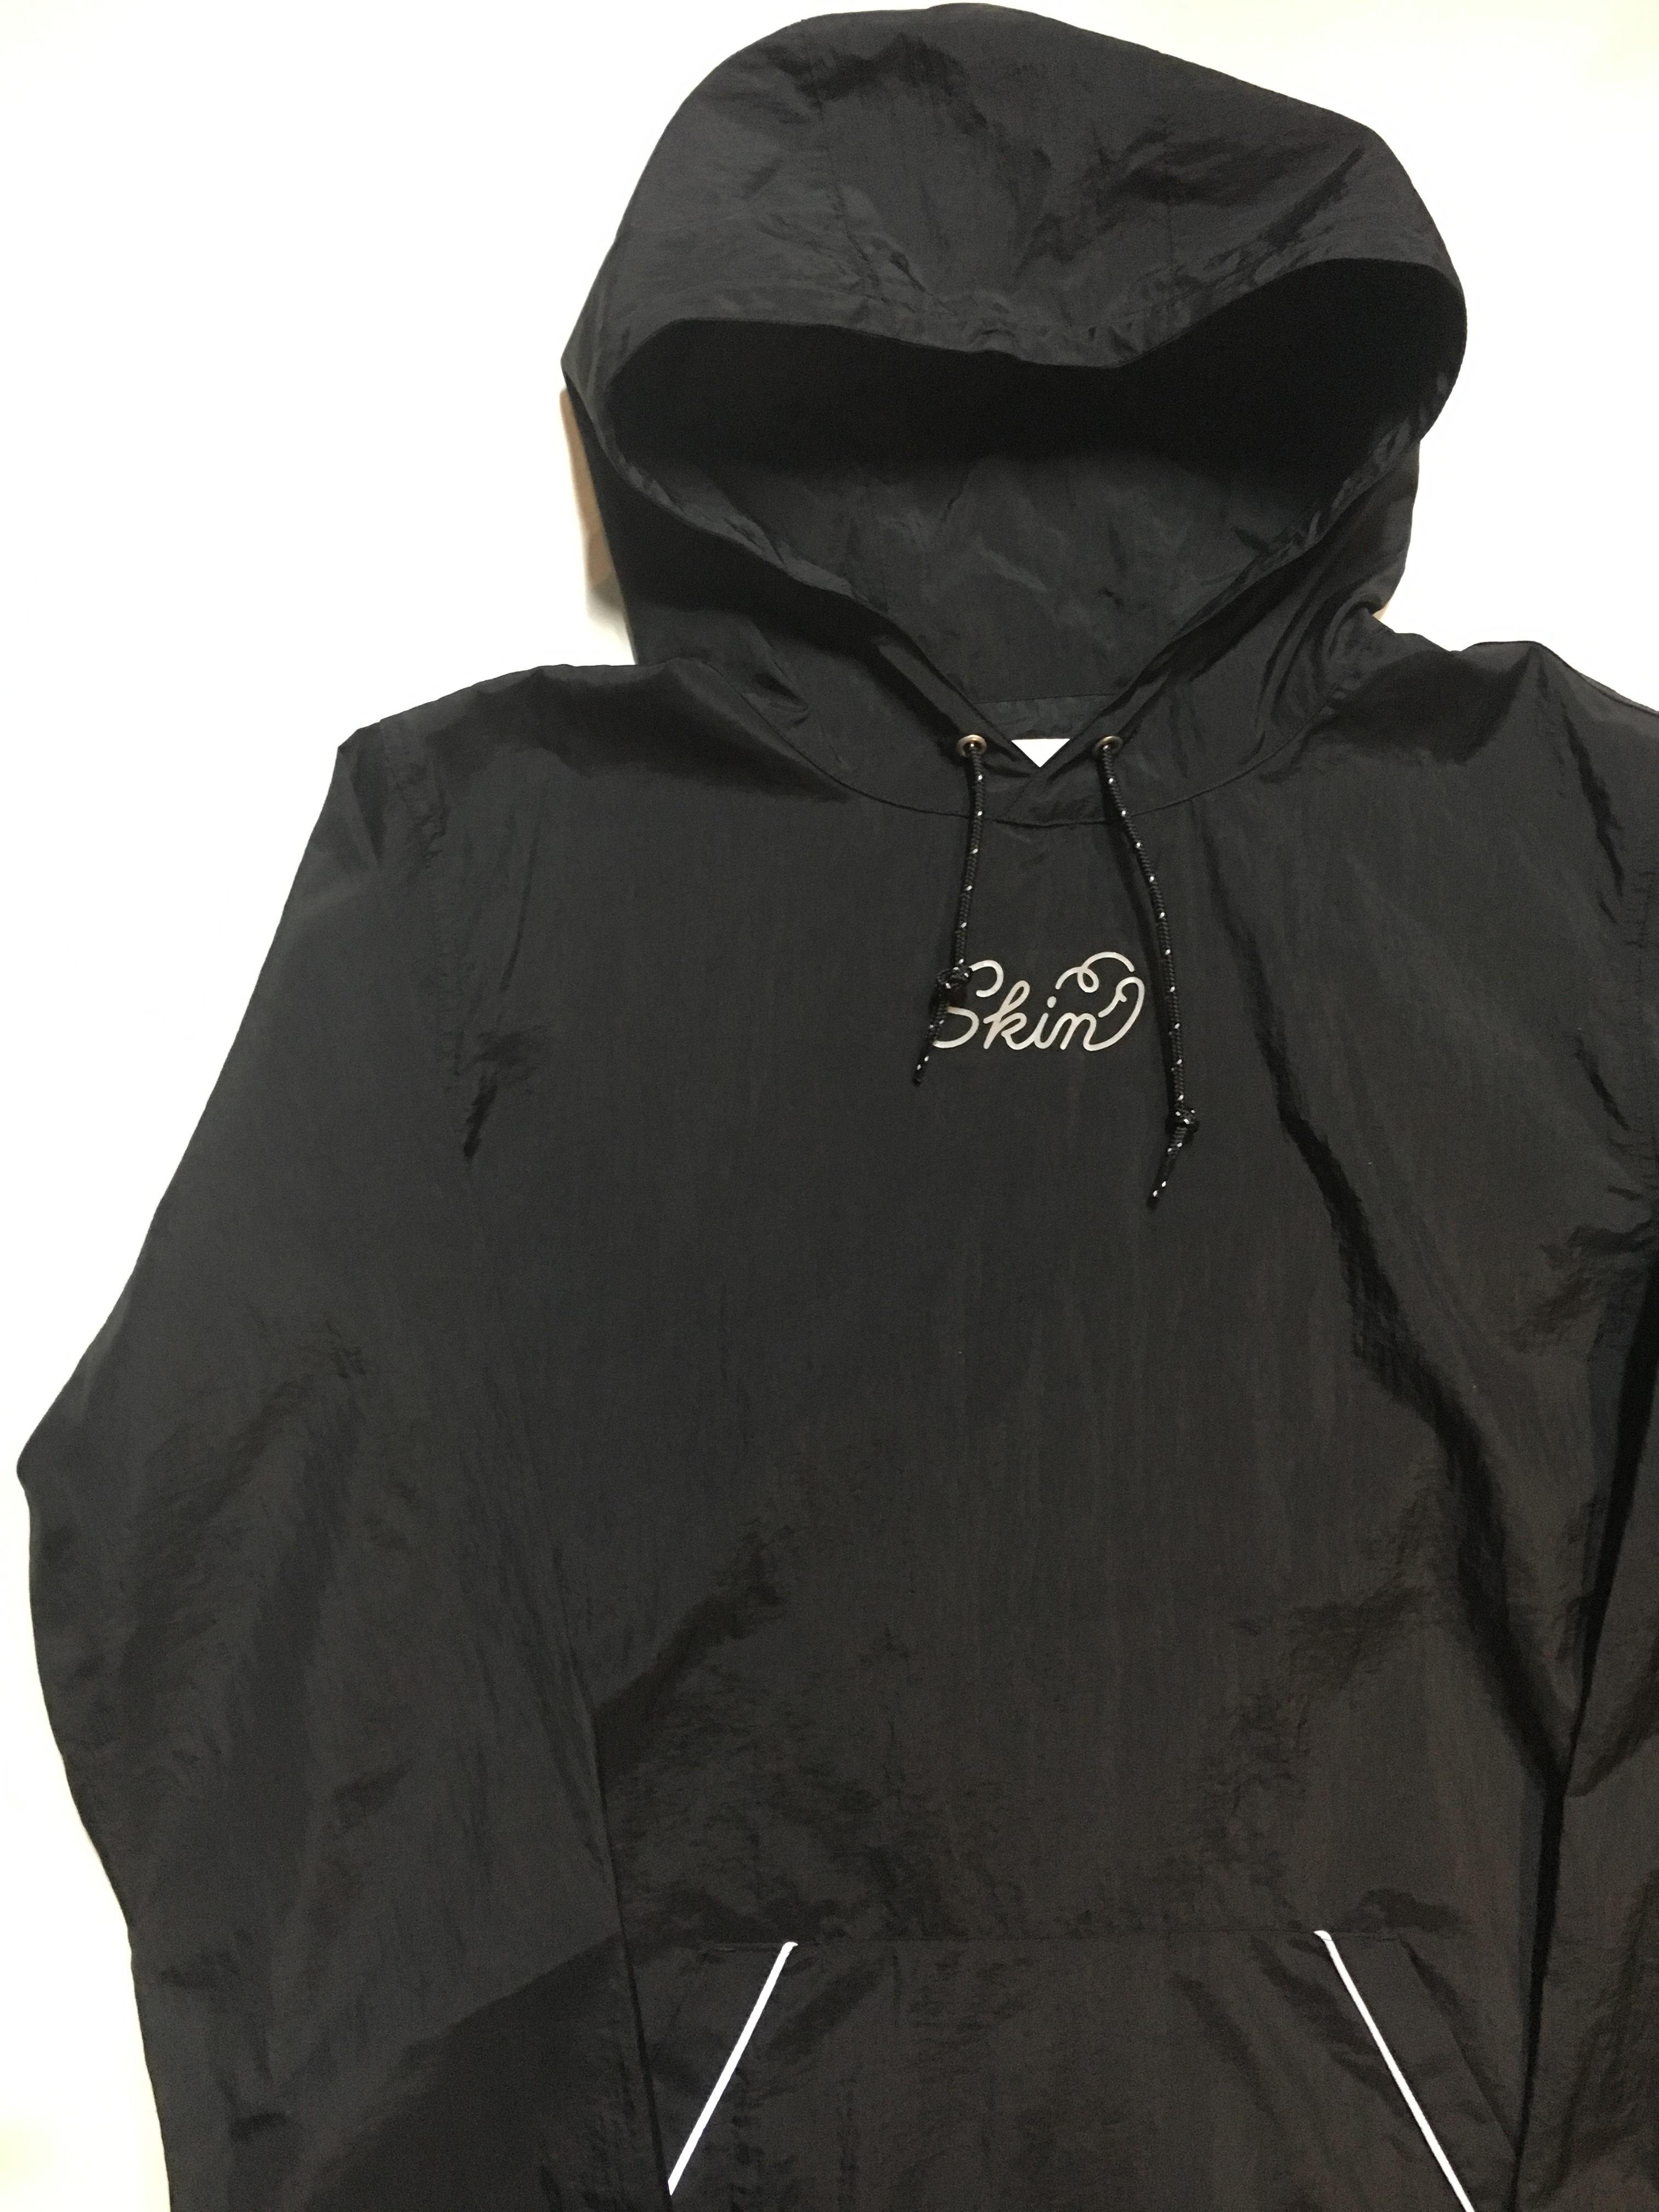 SKIN / nylon hoodie(blk) - 画像4